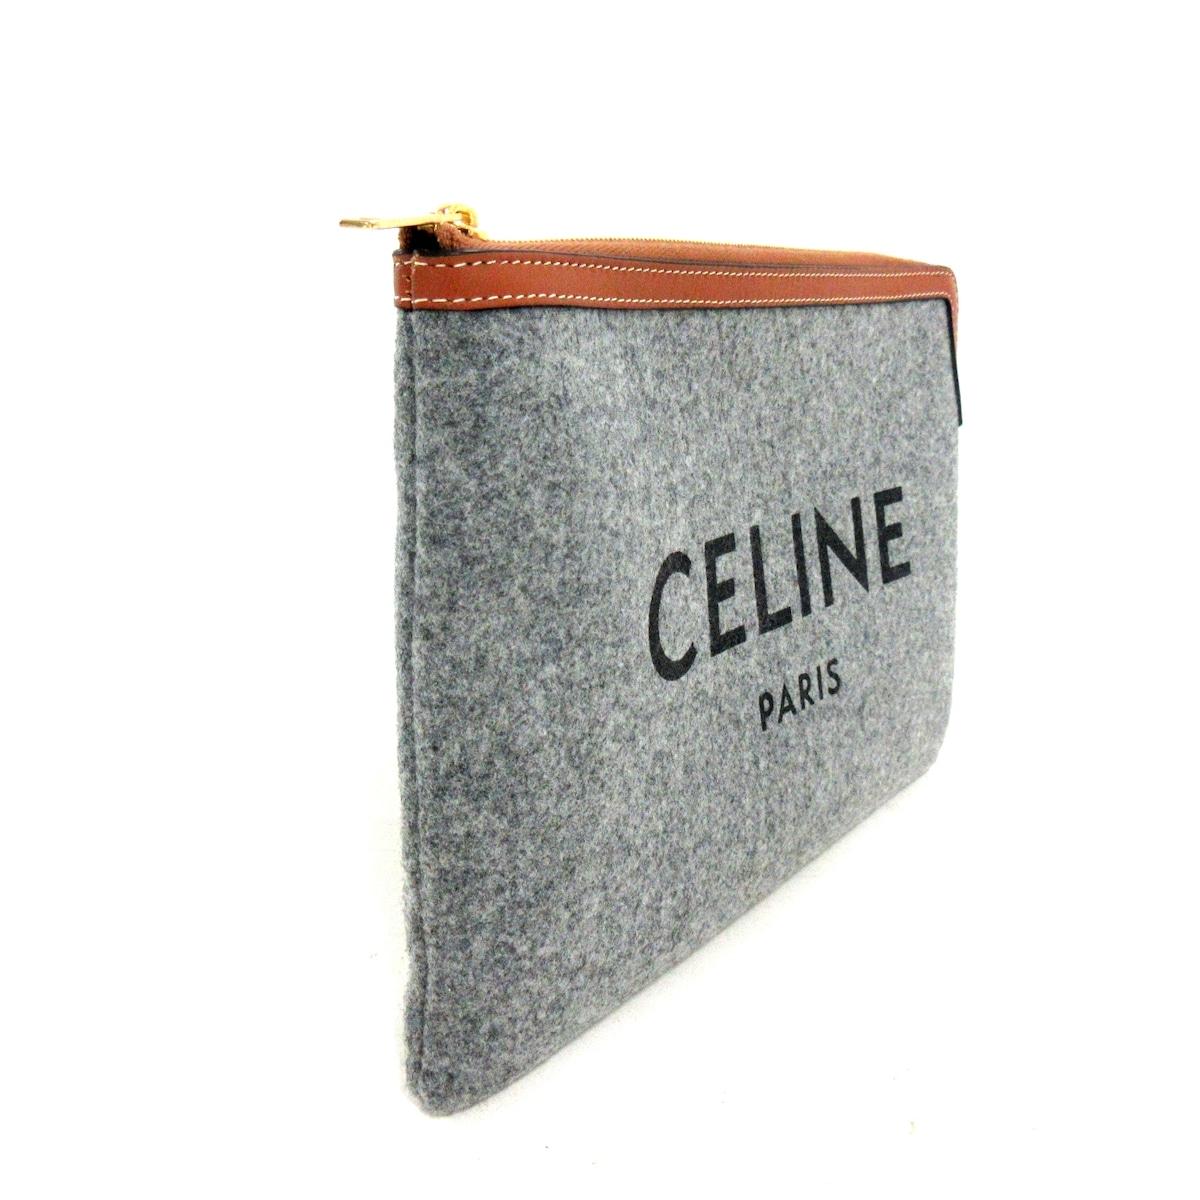 CELINE(セリーヌ)のスモール ポーチ